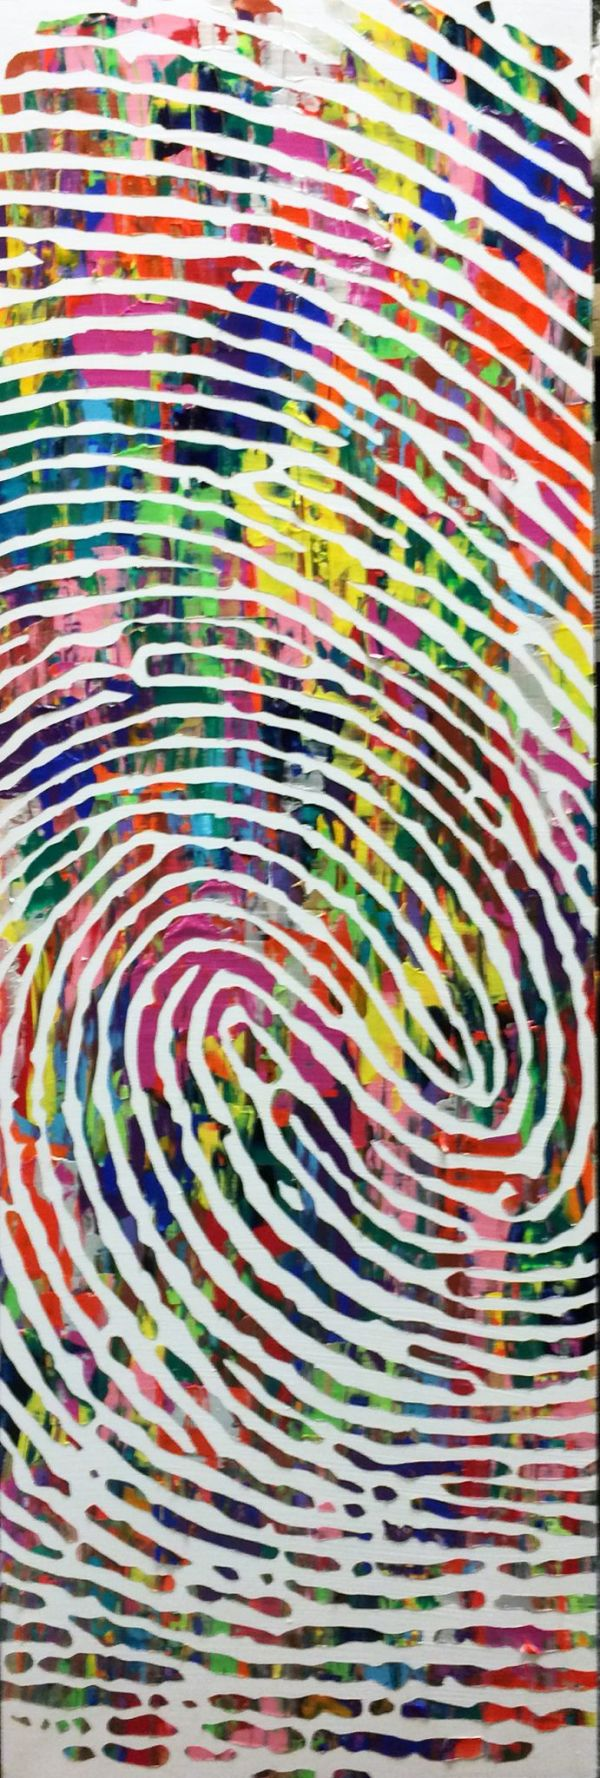 Identity by Sean Christopher Ward